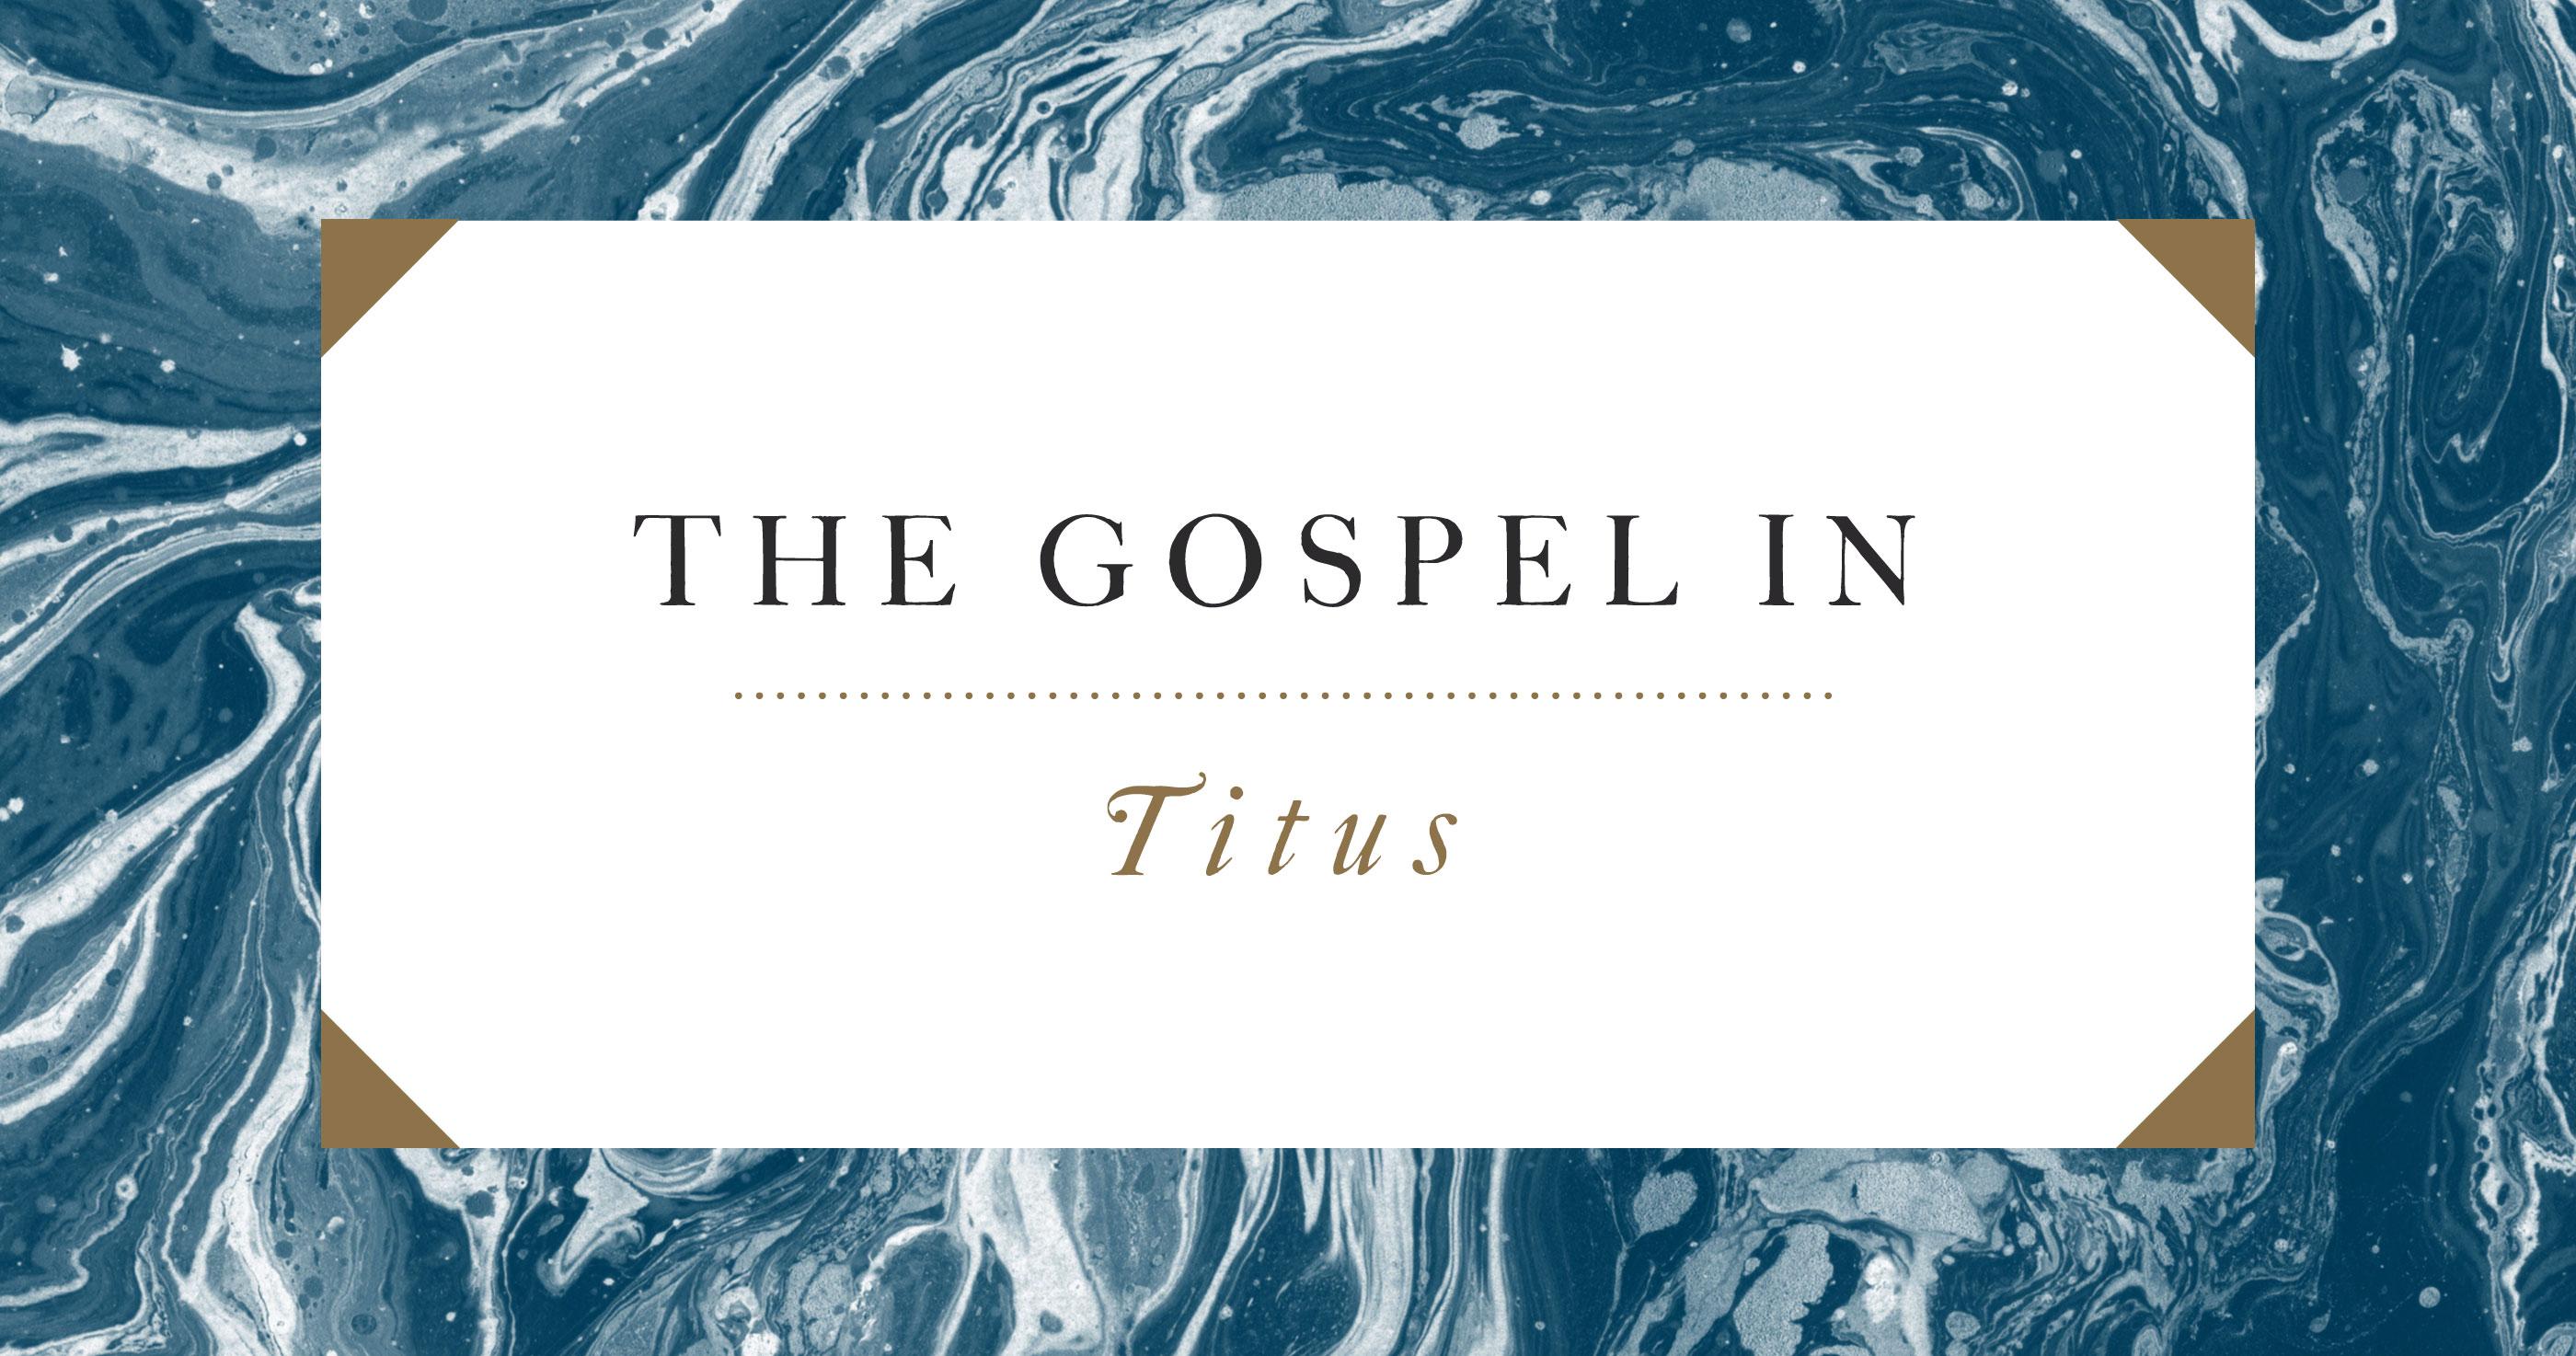 The Gospel in Titus